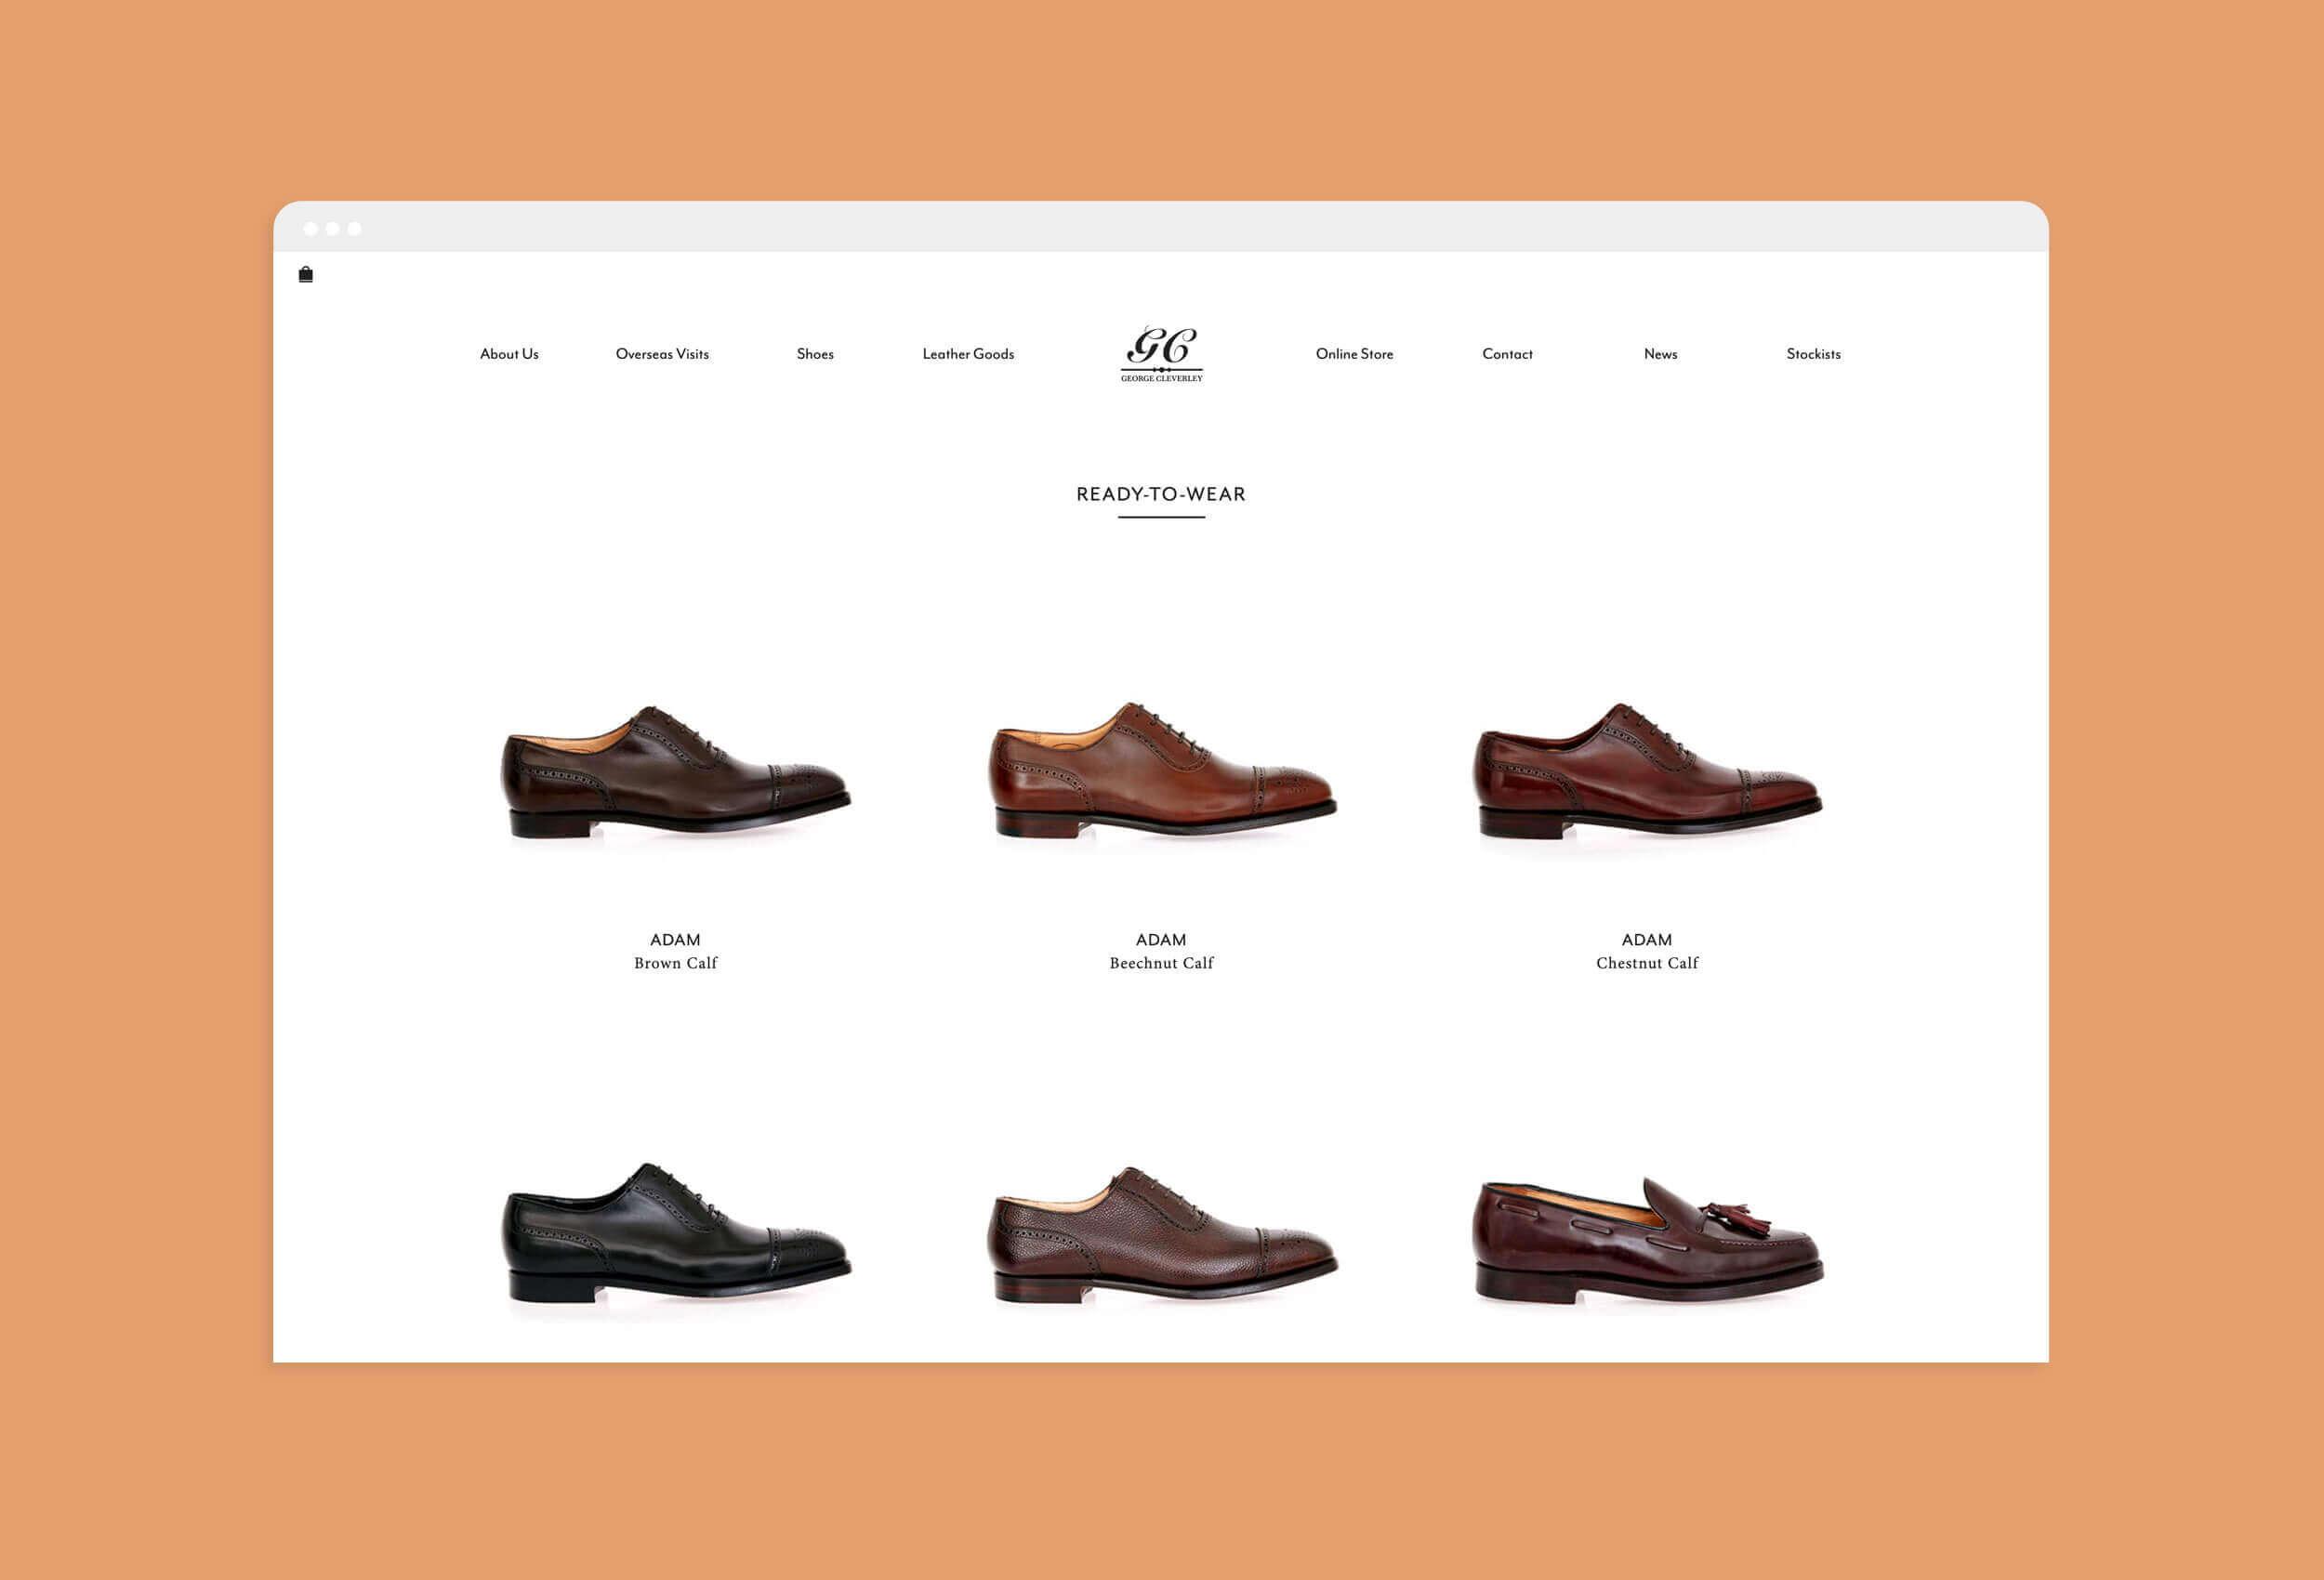 George Cleverley website screenshot